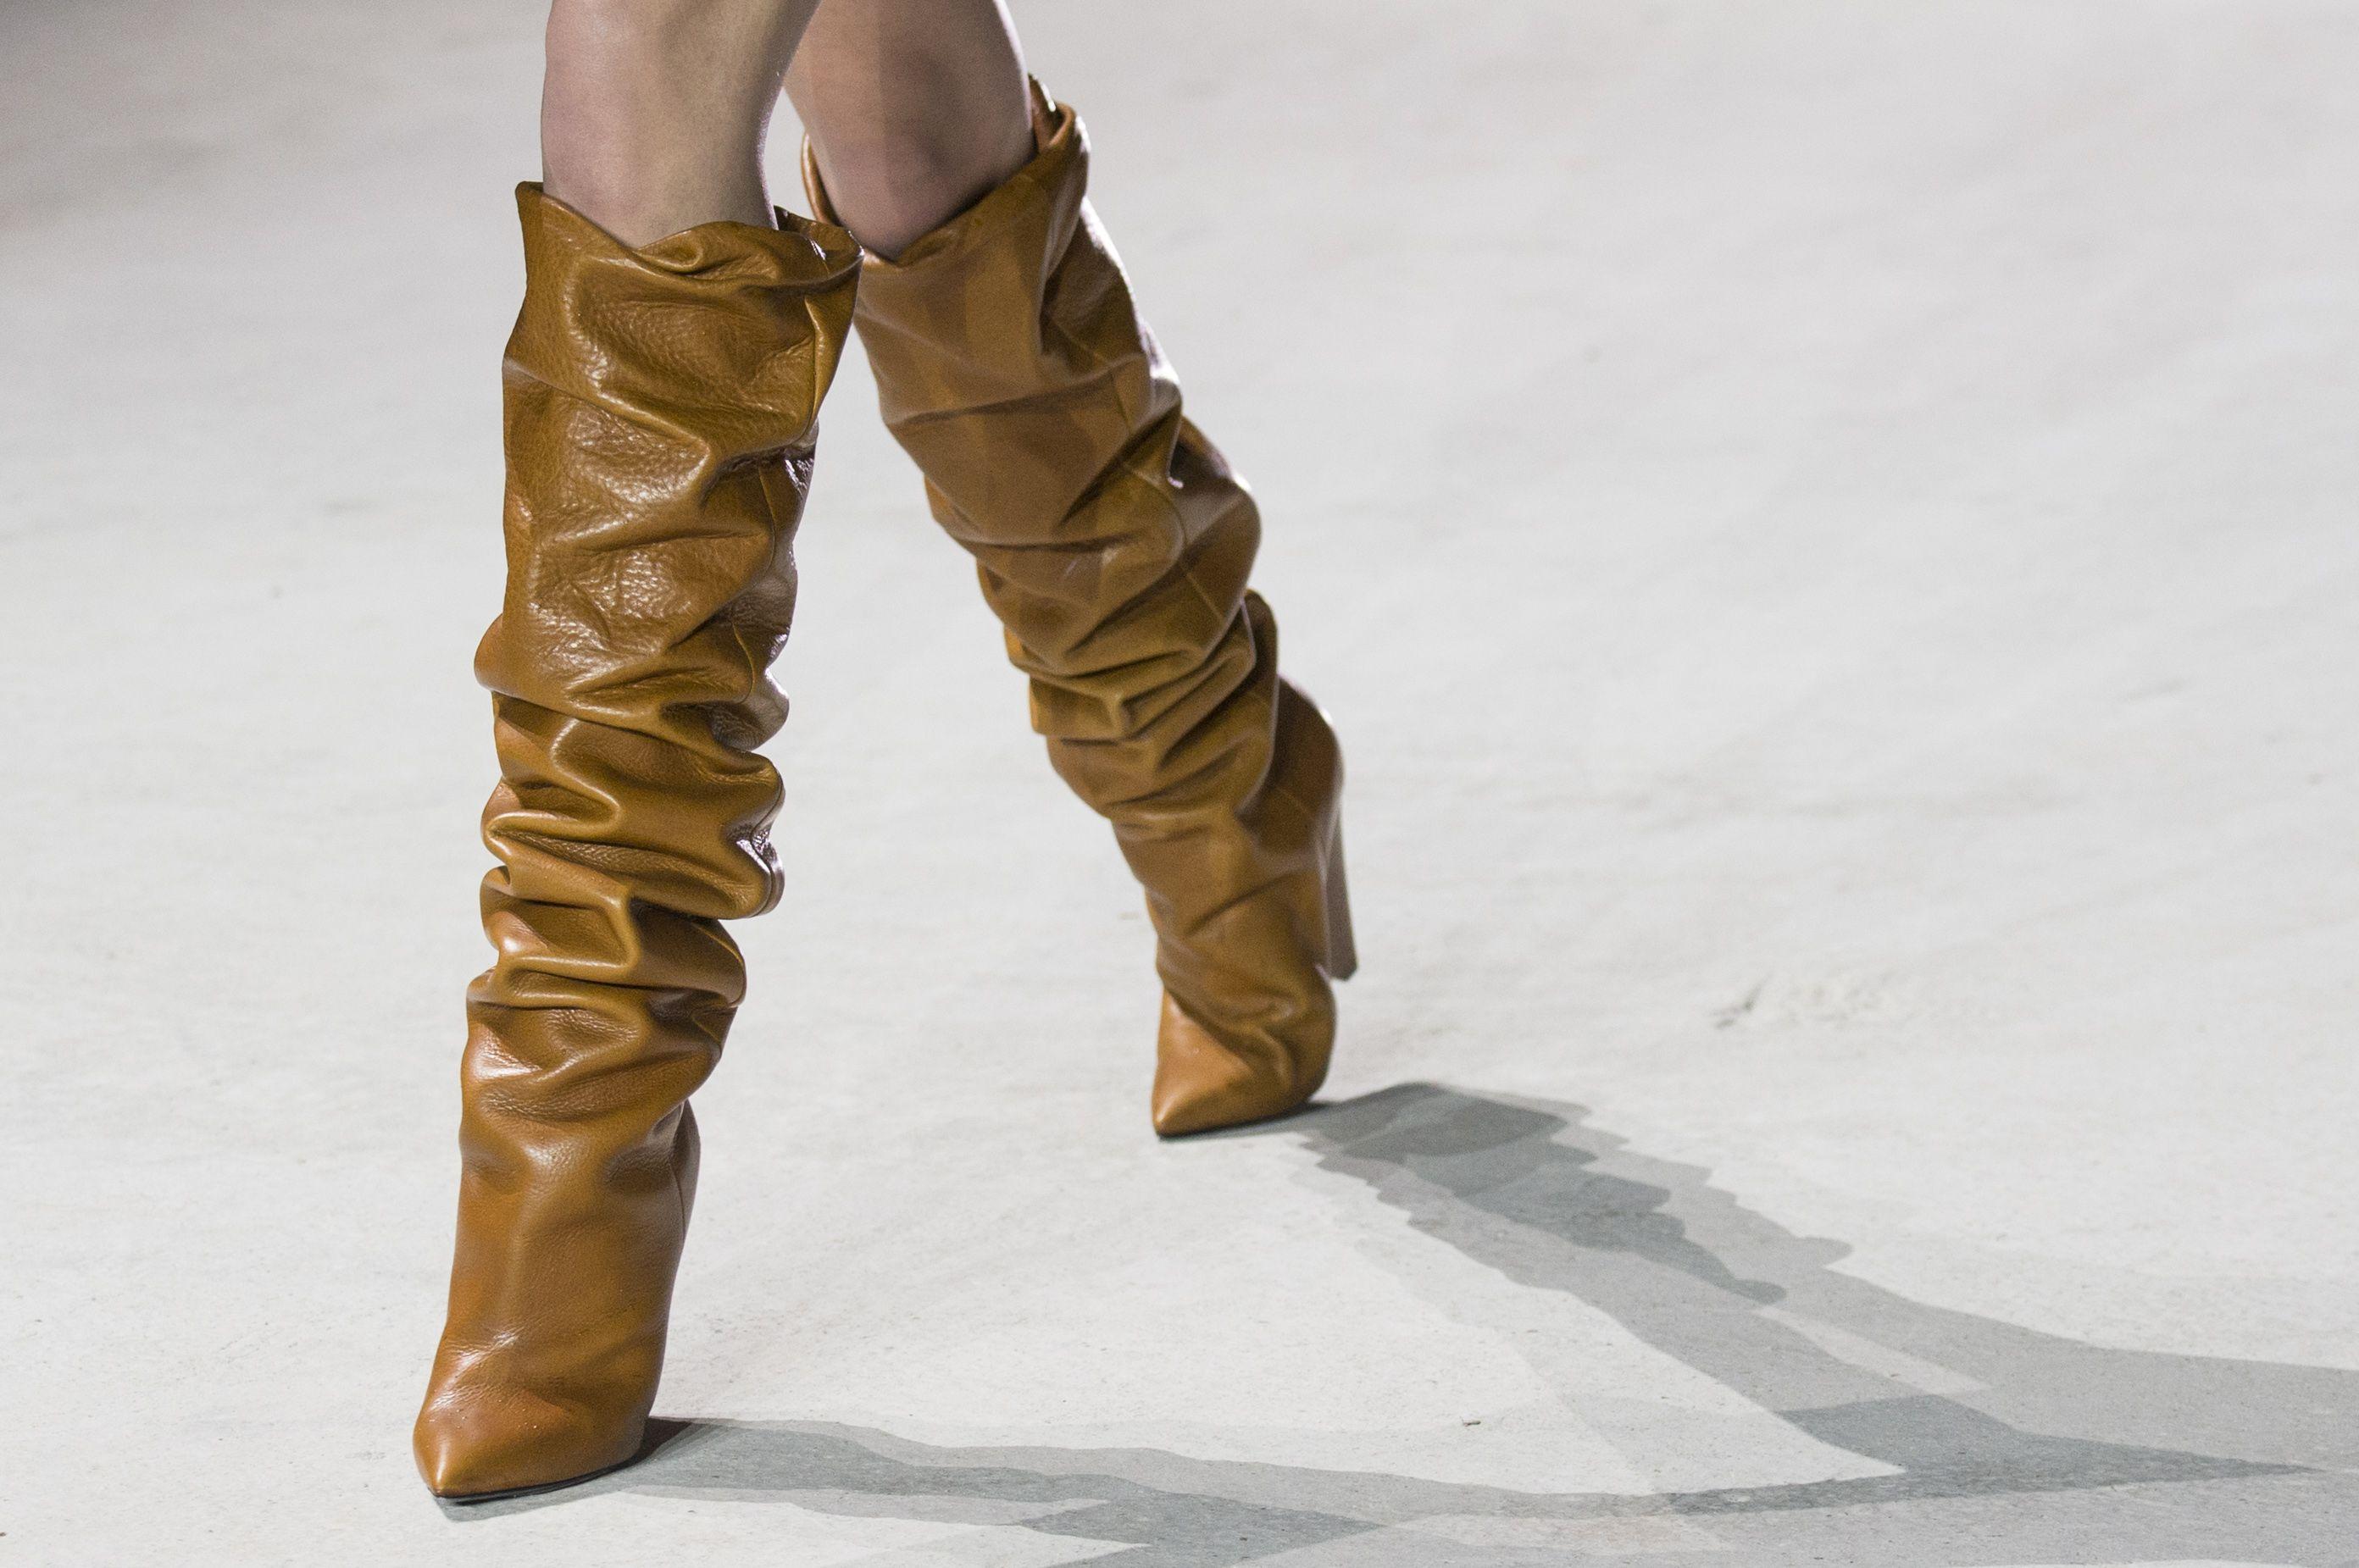 Model details on the catwalkSaint Laurent show, Runway, Autumn Winter 2017, Paris Fashion Week, France - 28 Feb 2017